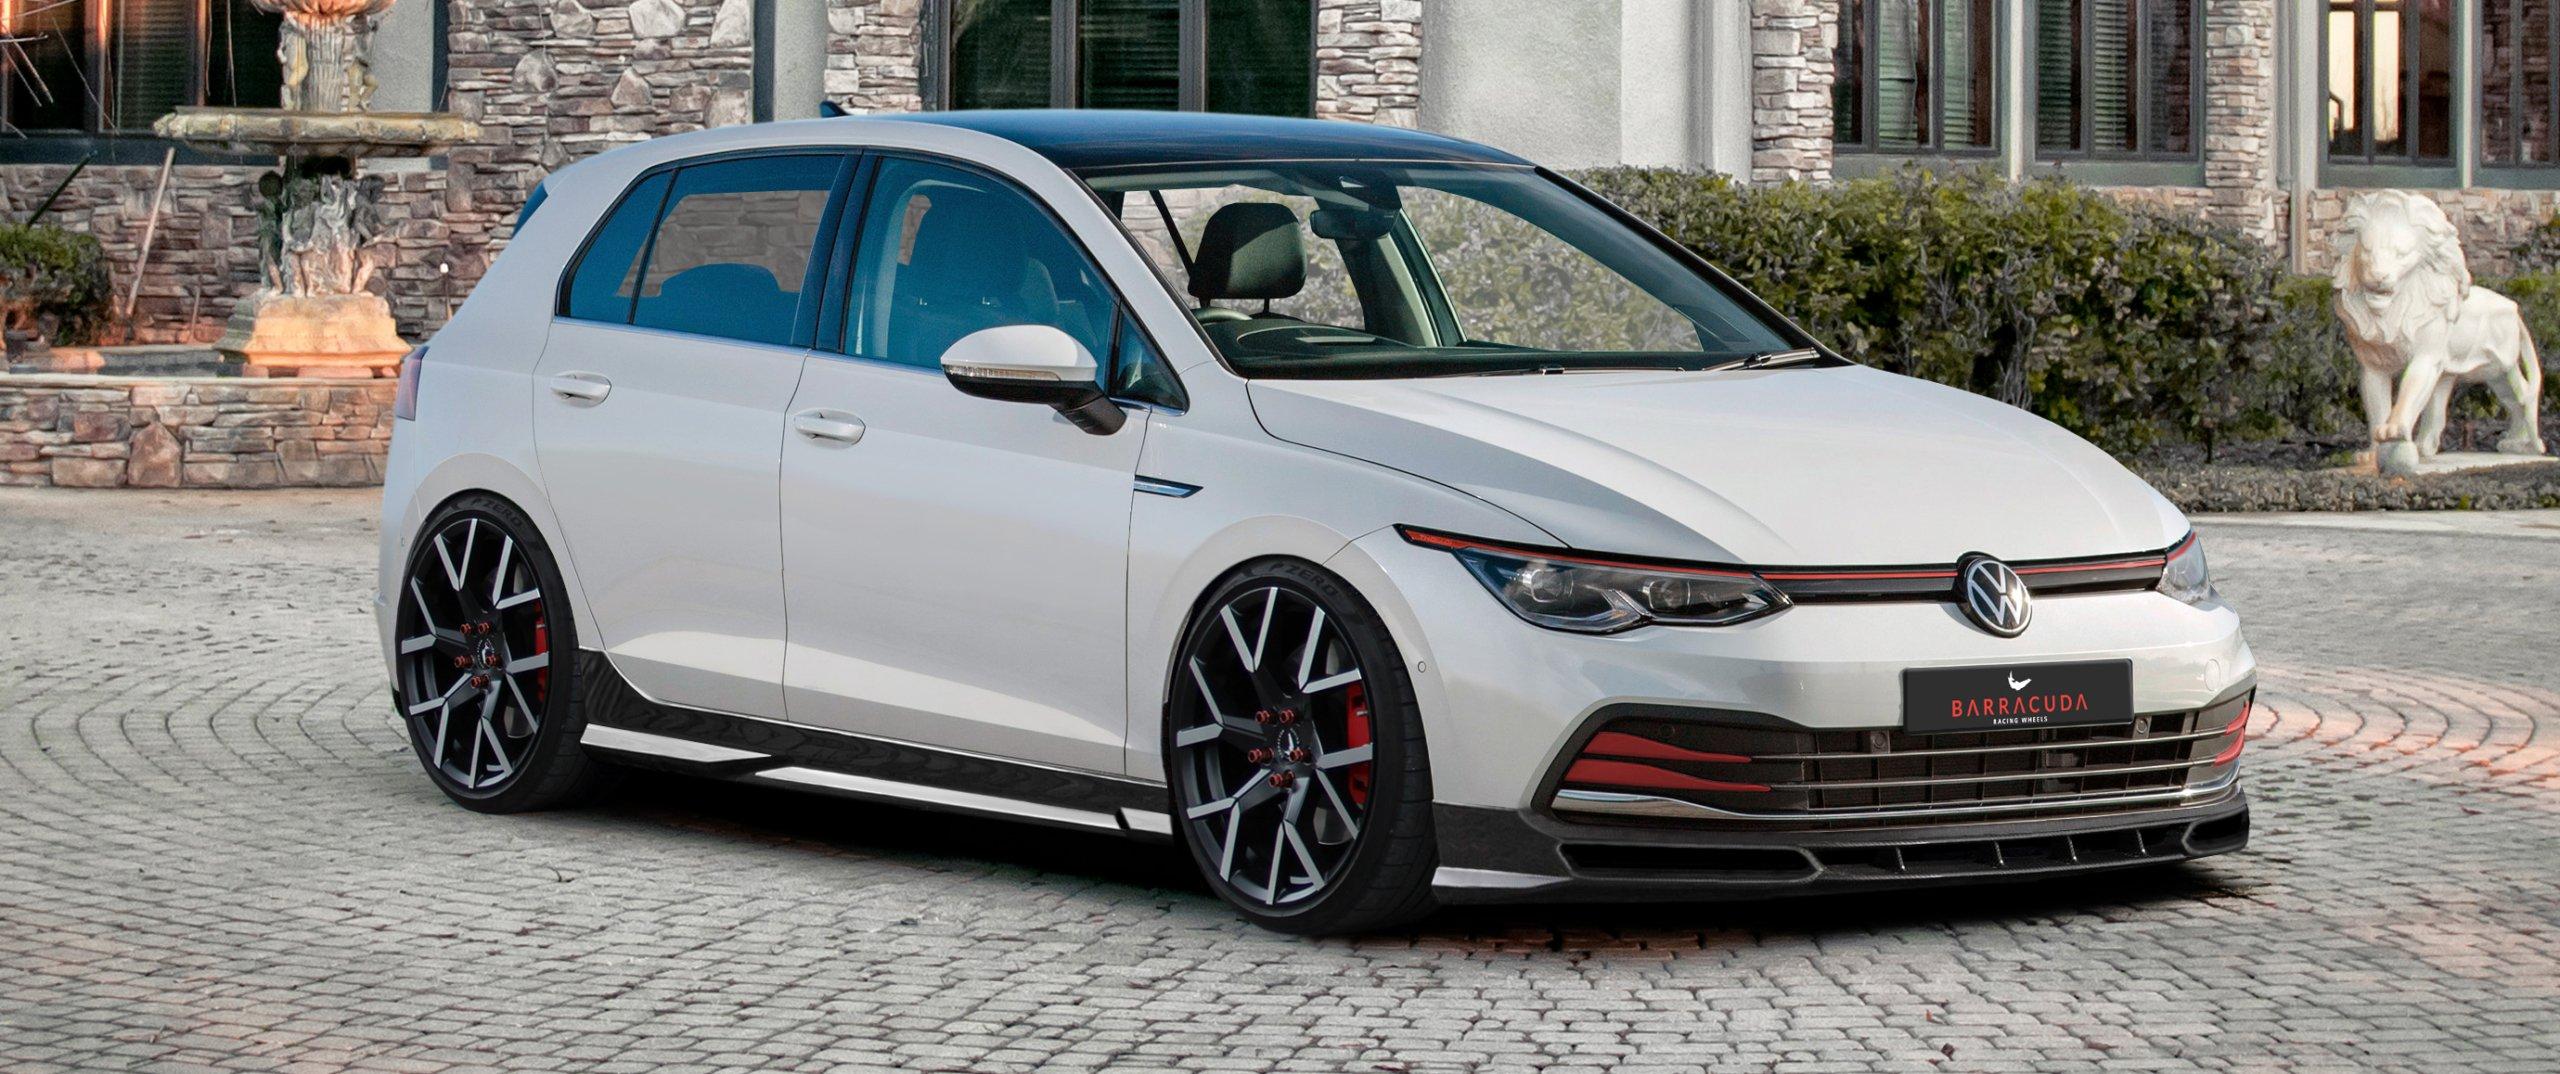 VW – Golf 8 – Weiß – BARRACUDA – Tzunamee EVO – Gunmetall – 19 Zoll